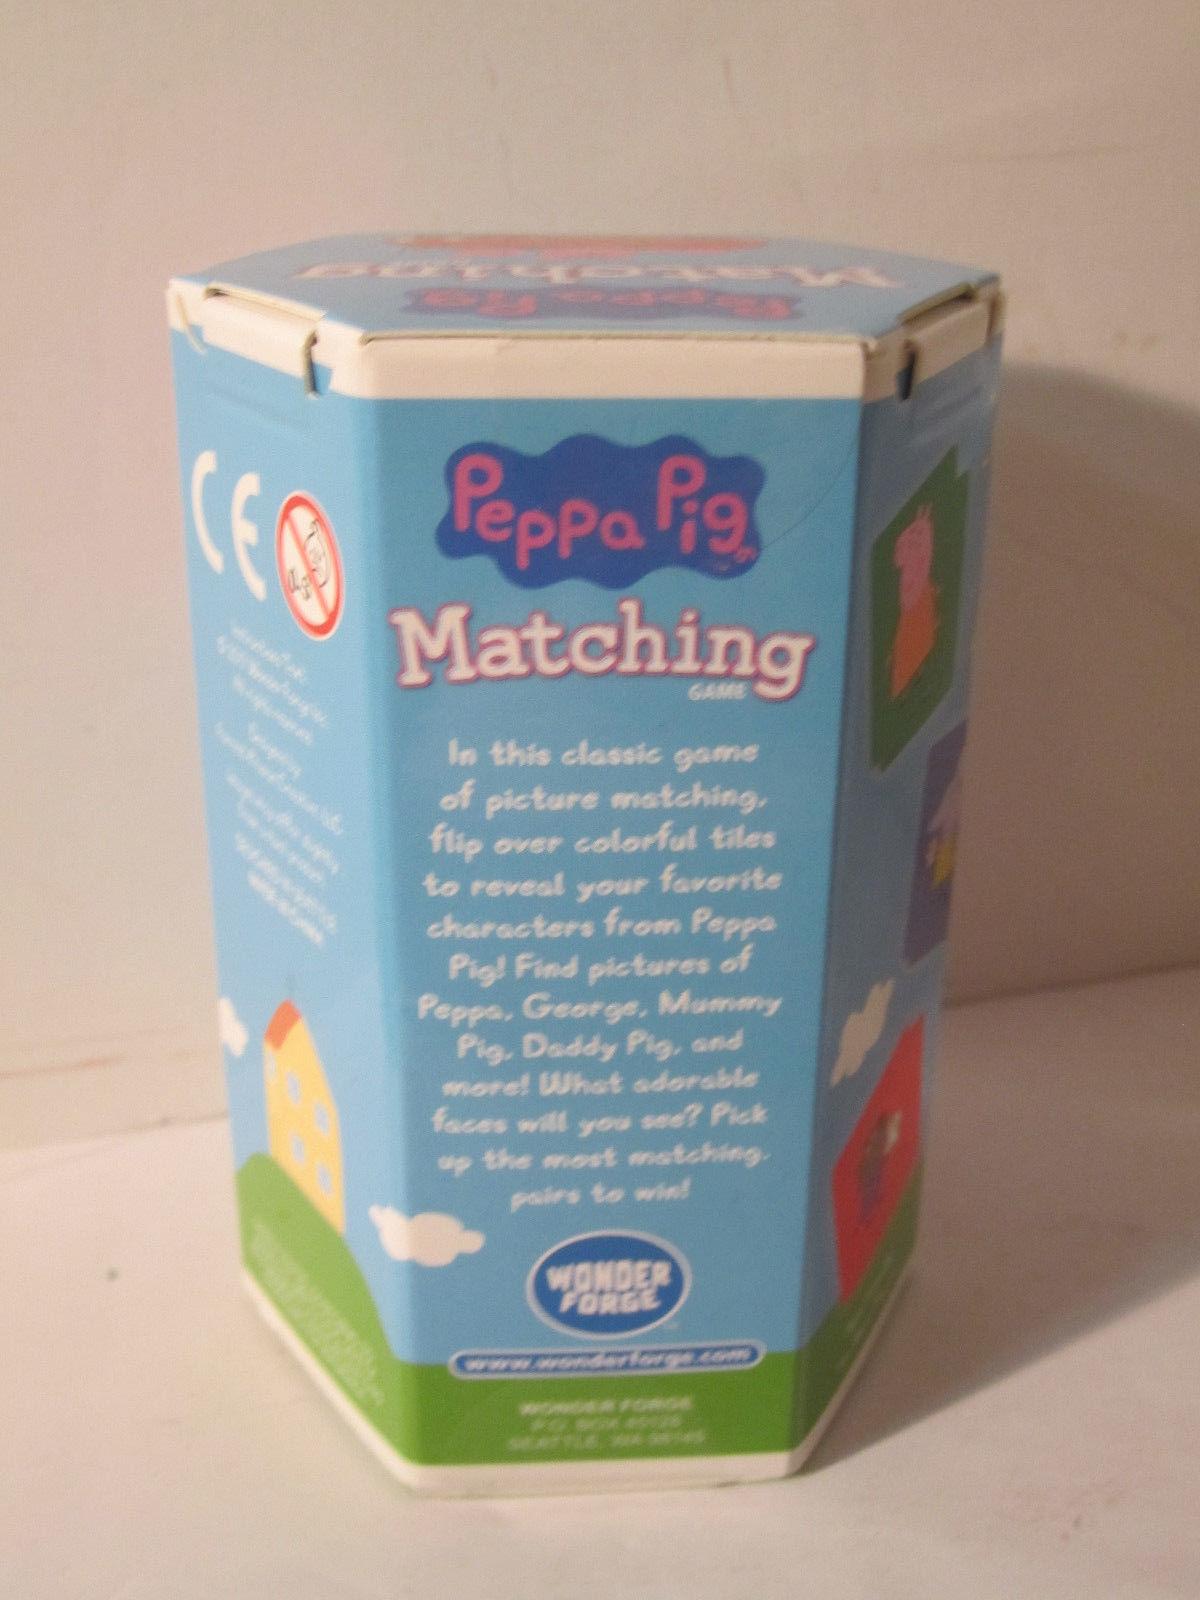 Peppa Pig Matching Game Sorting Game Toddler PreSchool Fun by Wonderforge NEW image 4